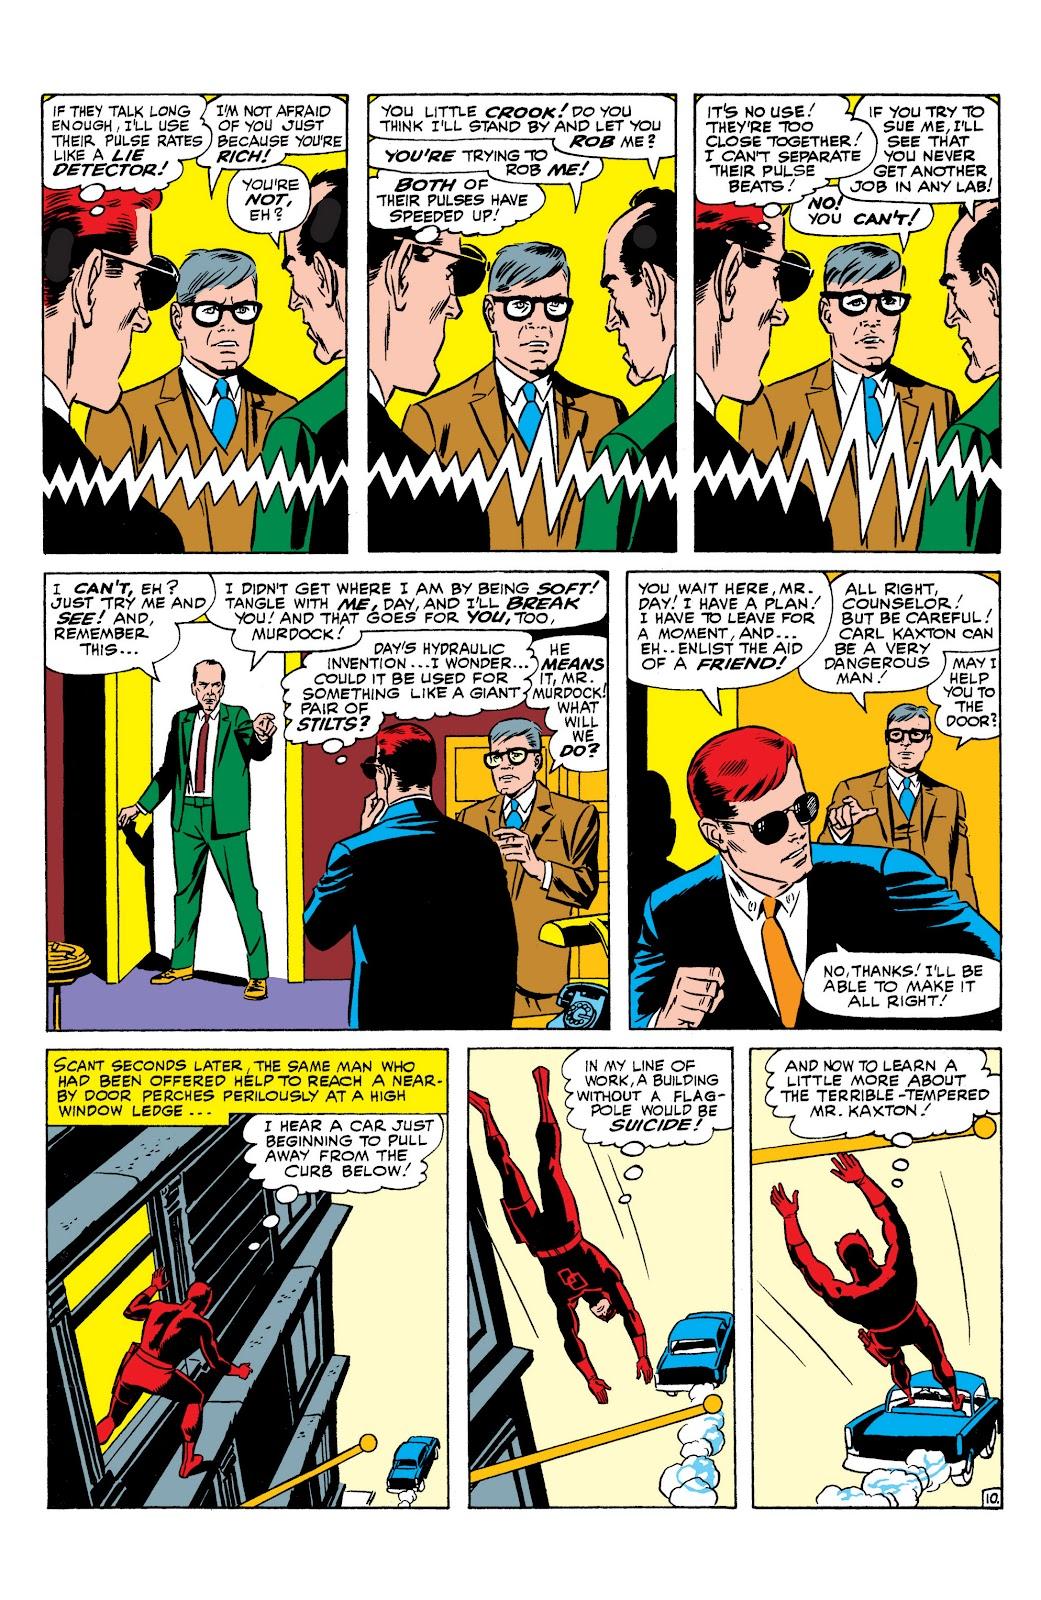 Read online Marvel Masterworks: Daredevil comic - Issue # TPB 1 (Part 2) - 74